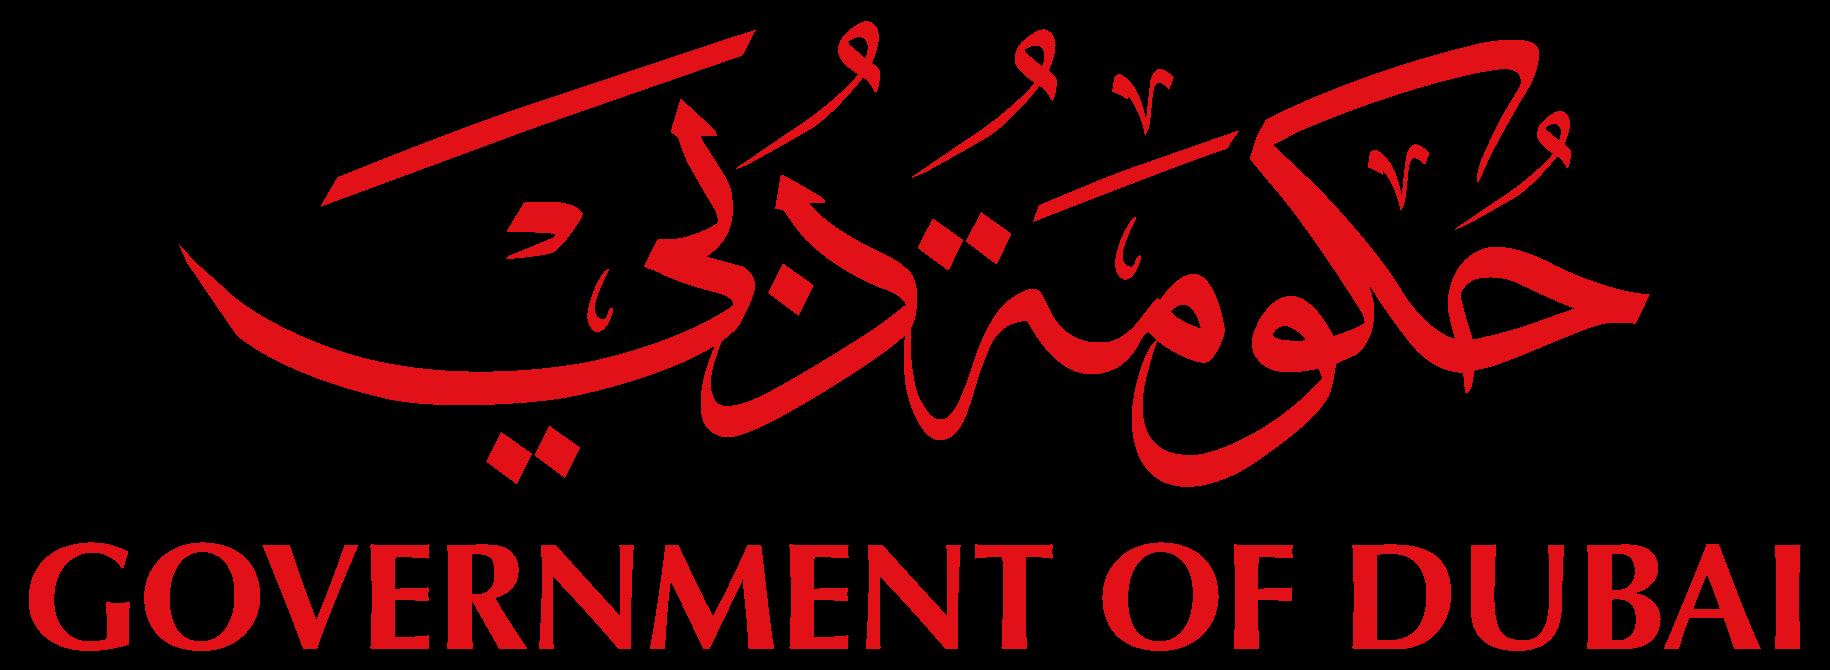 Dubai Government - Potential - Empower Clients